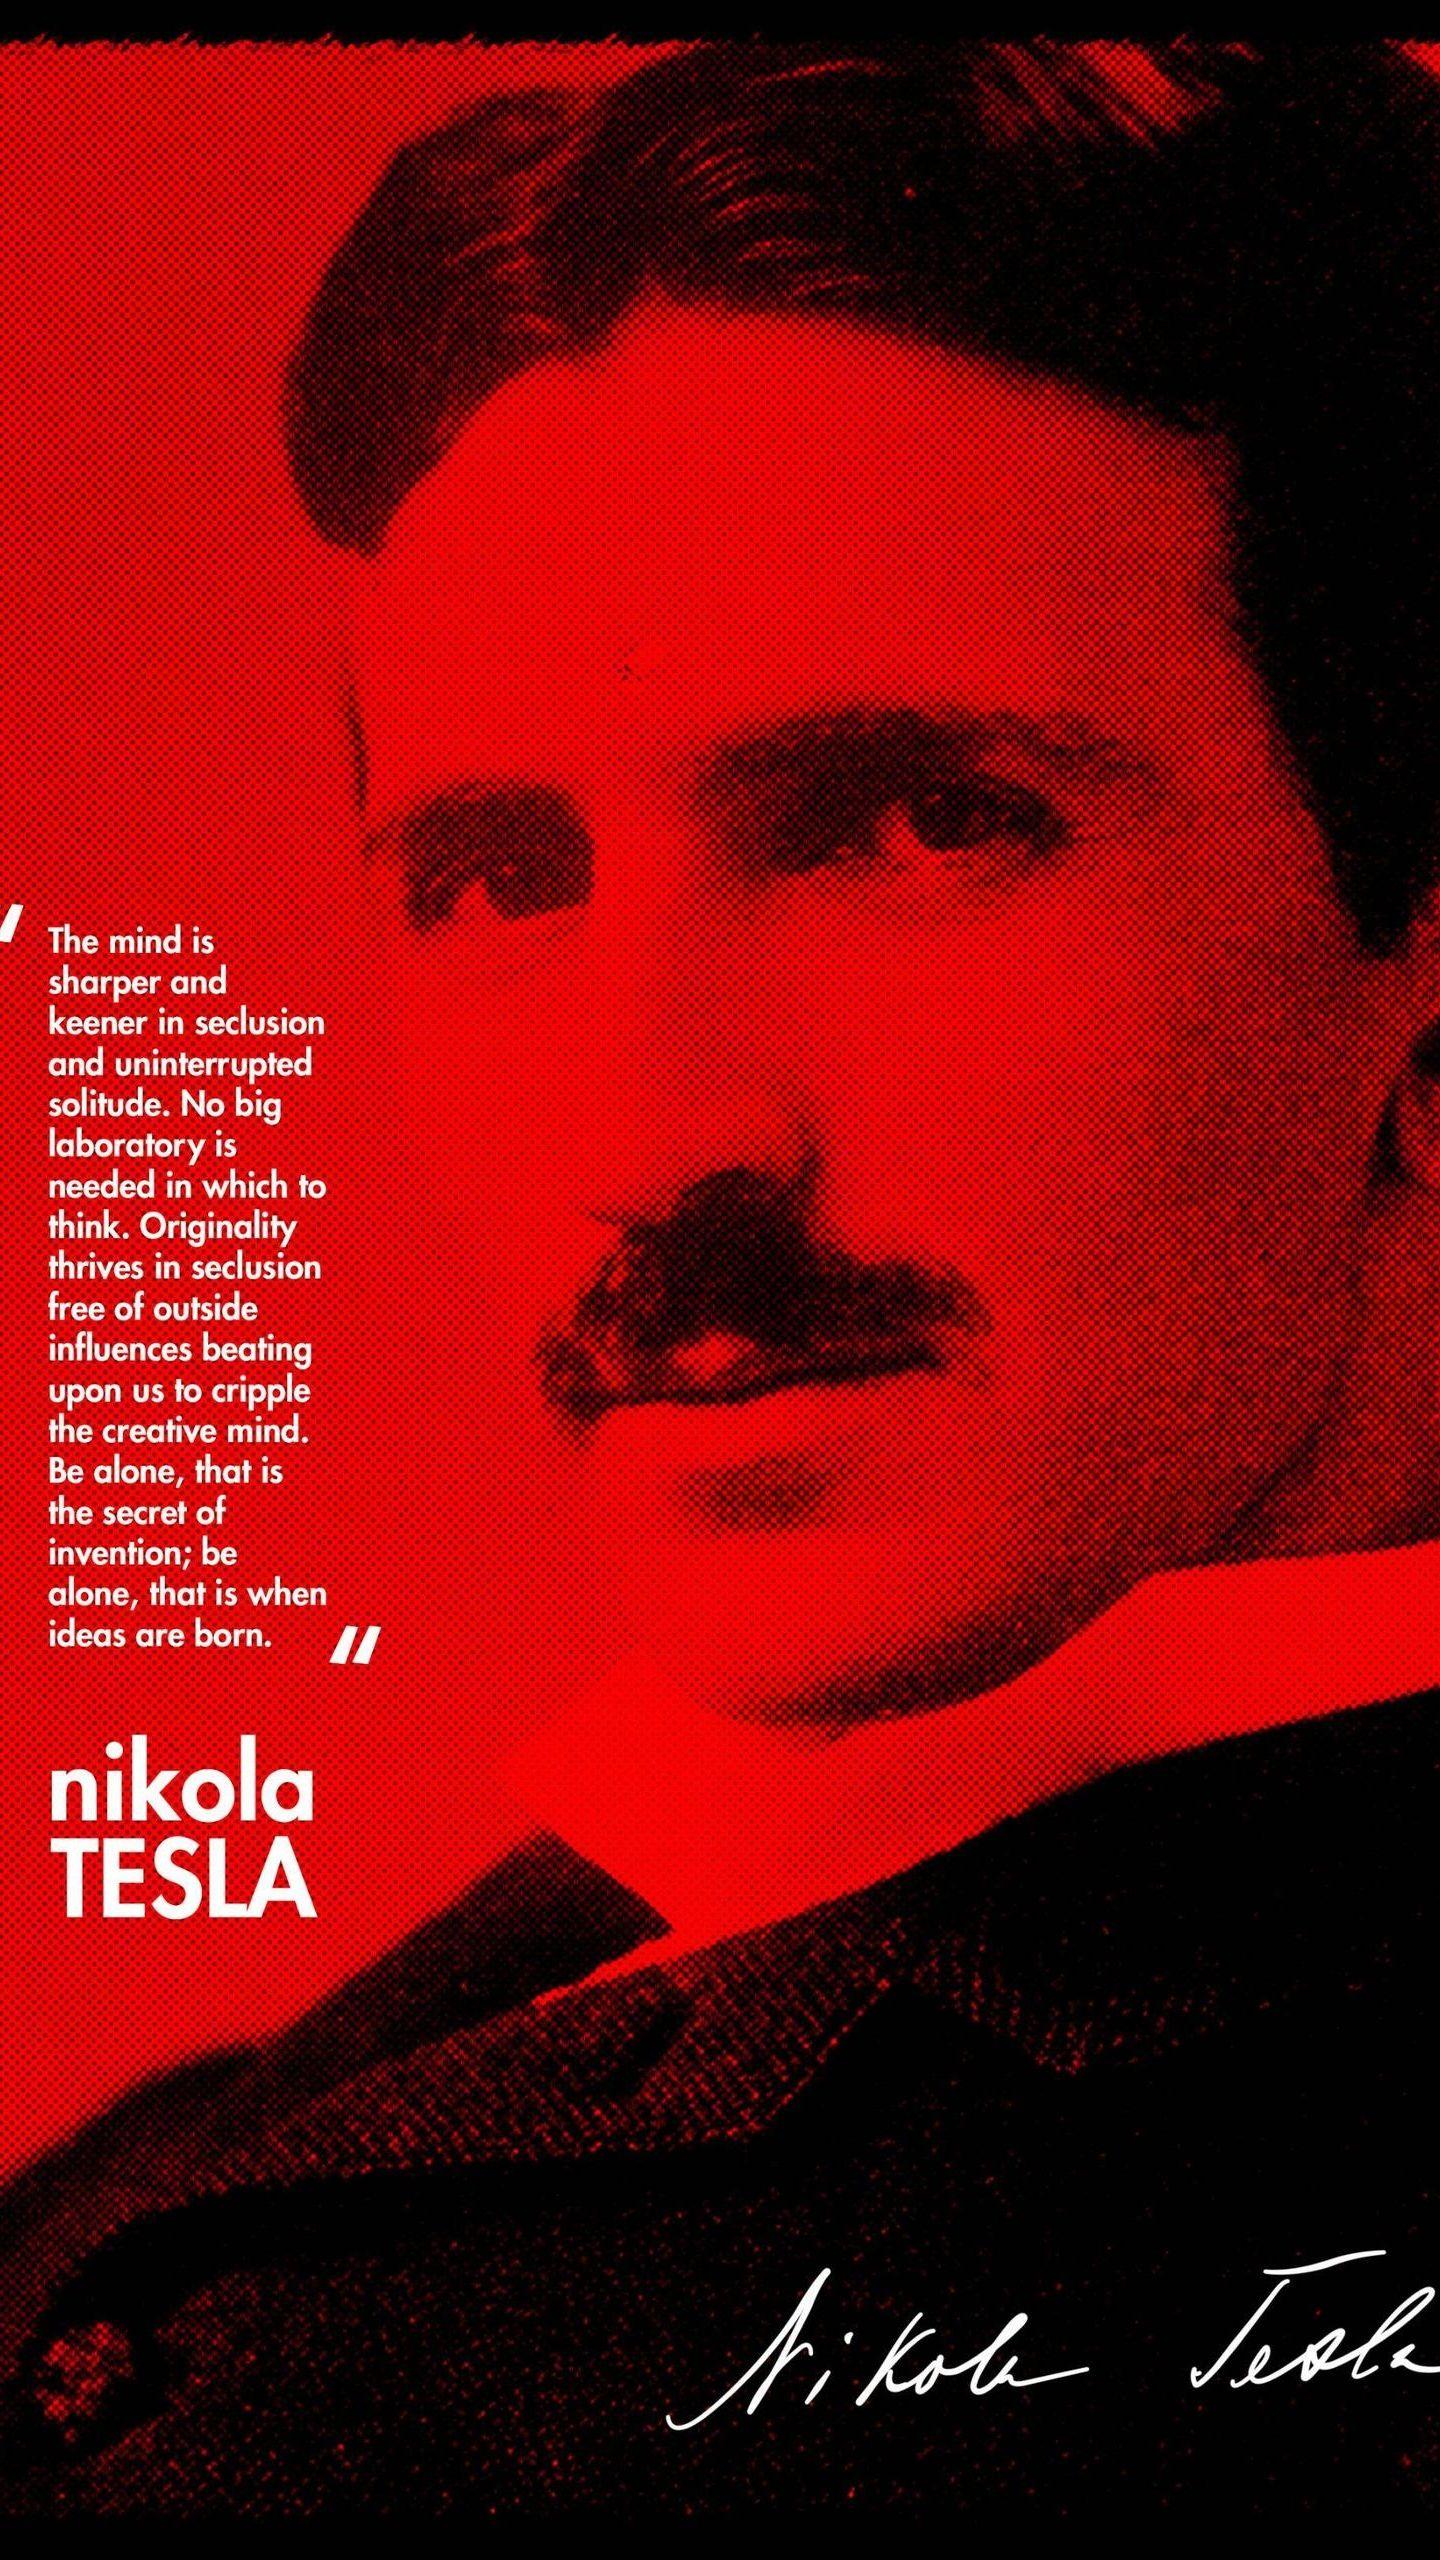 Nikola Tesla Smartphone Wallpapers - Wallpaper Cave